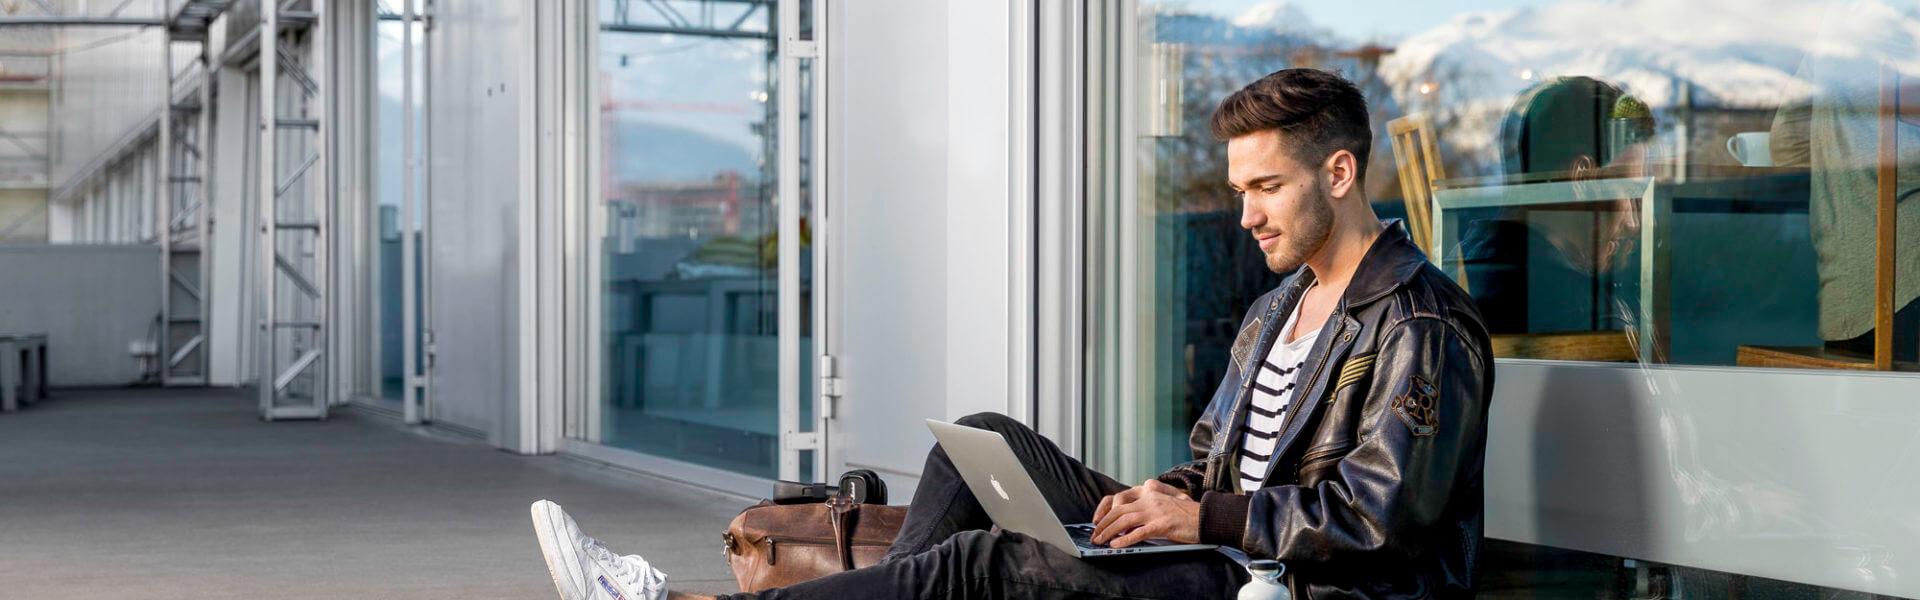 Netzwerktechniker studiert Laptop